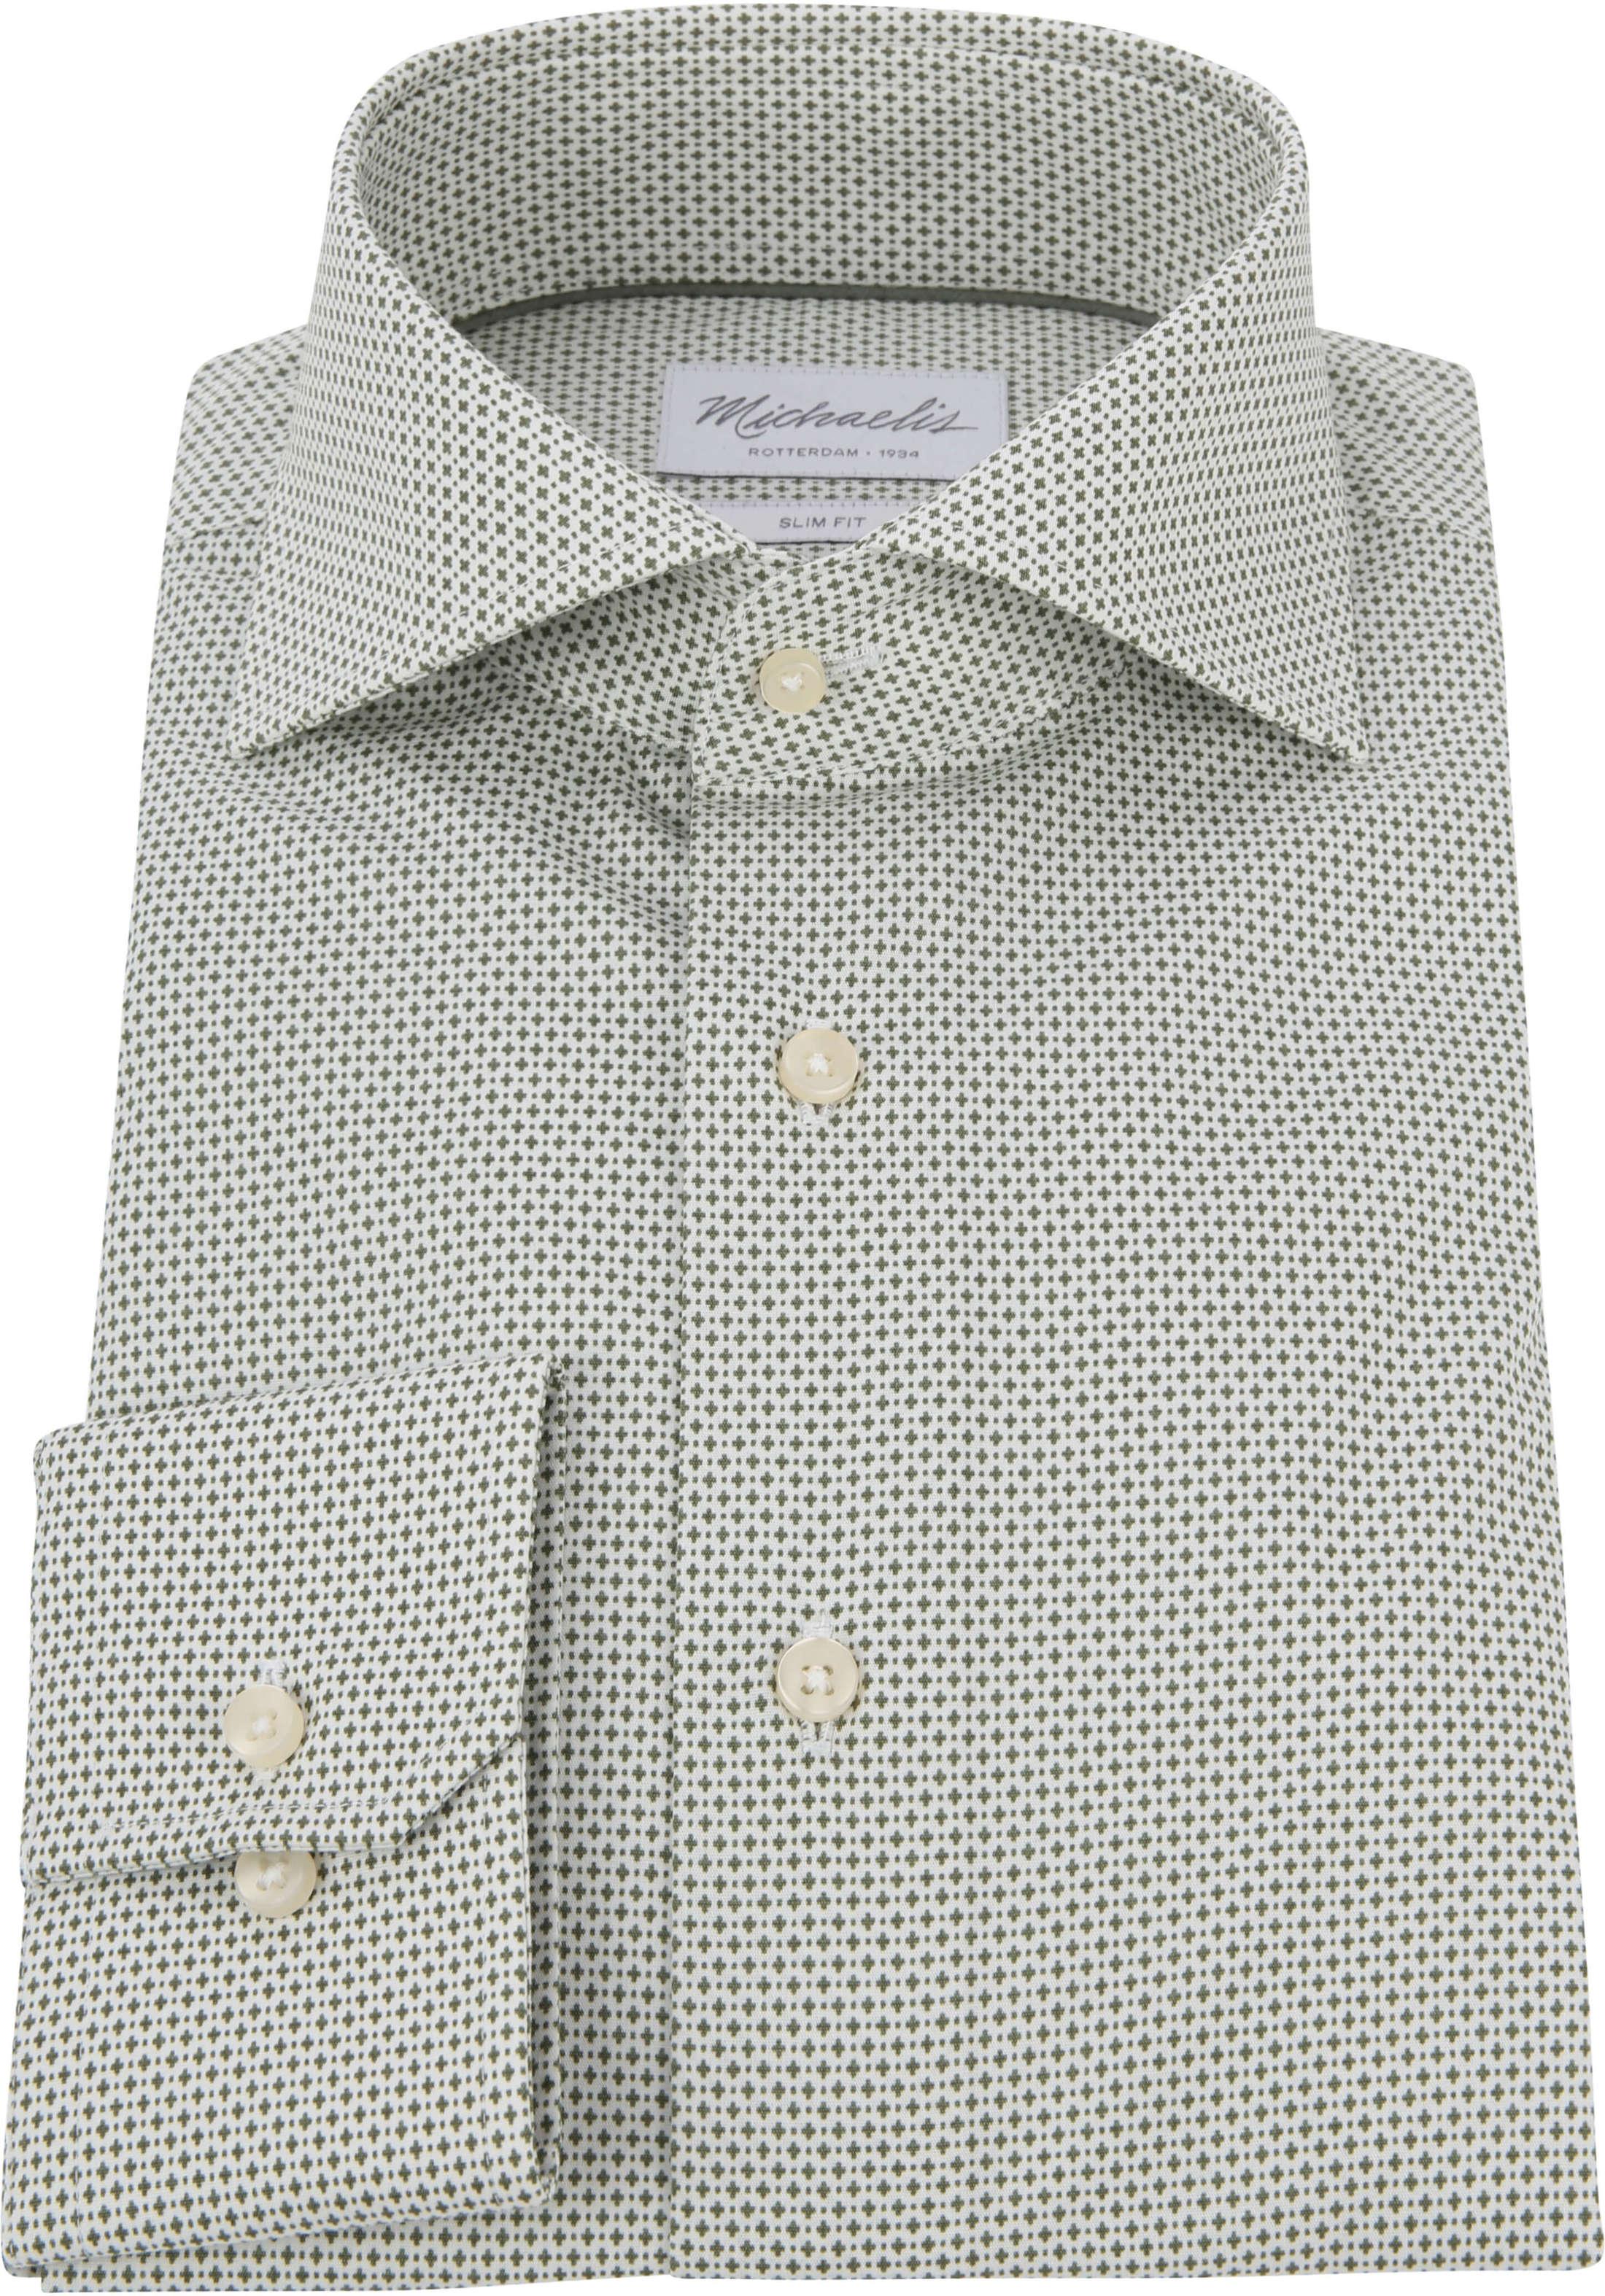 Michaelis Overhemd Strijkvrij Dessin Olive foto 2